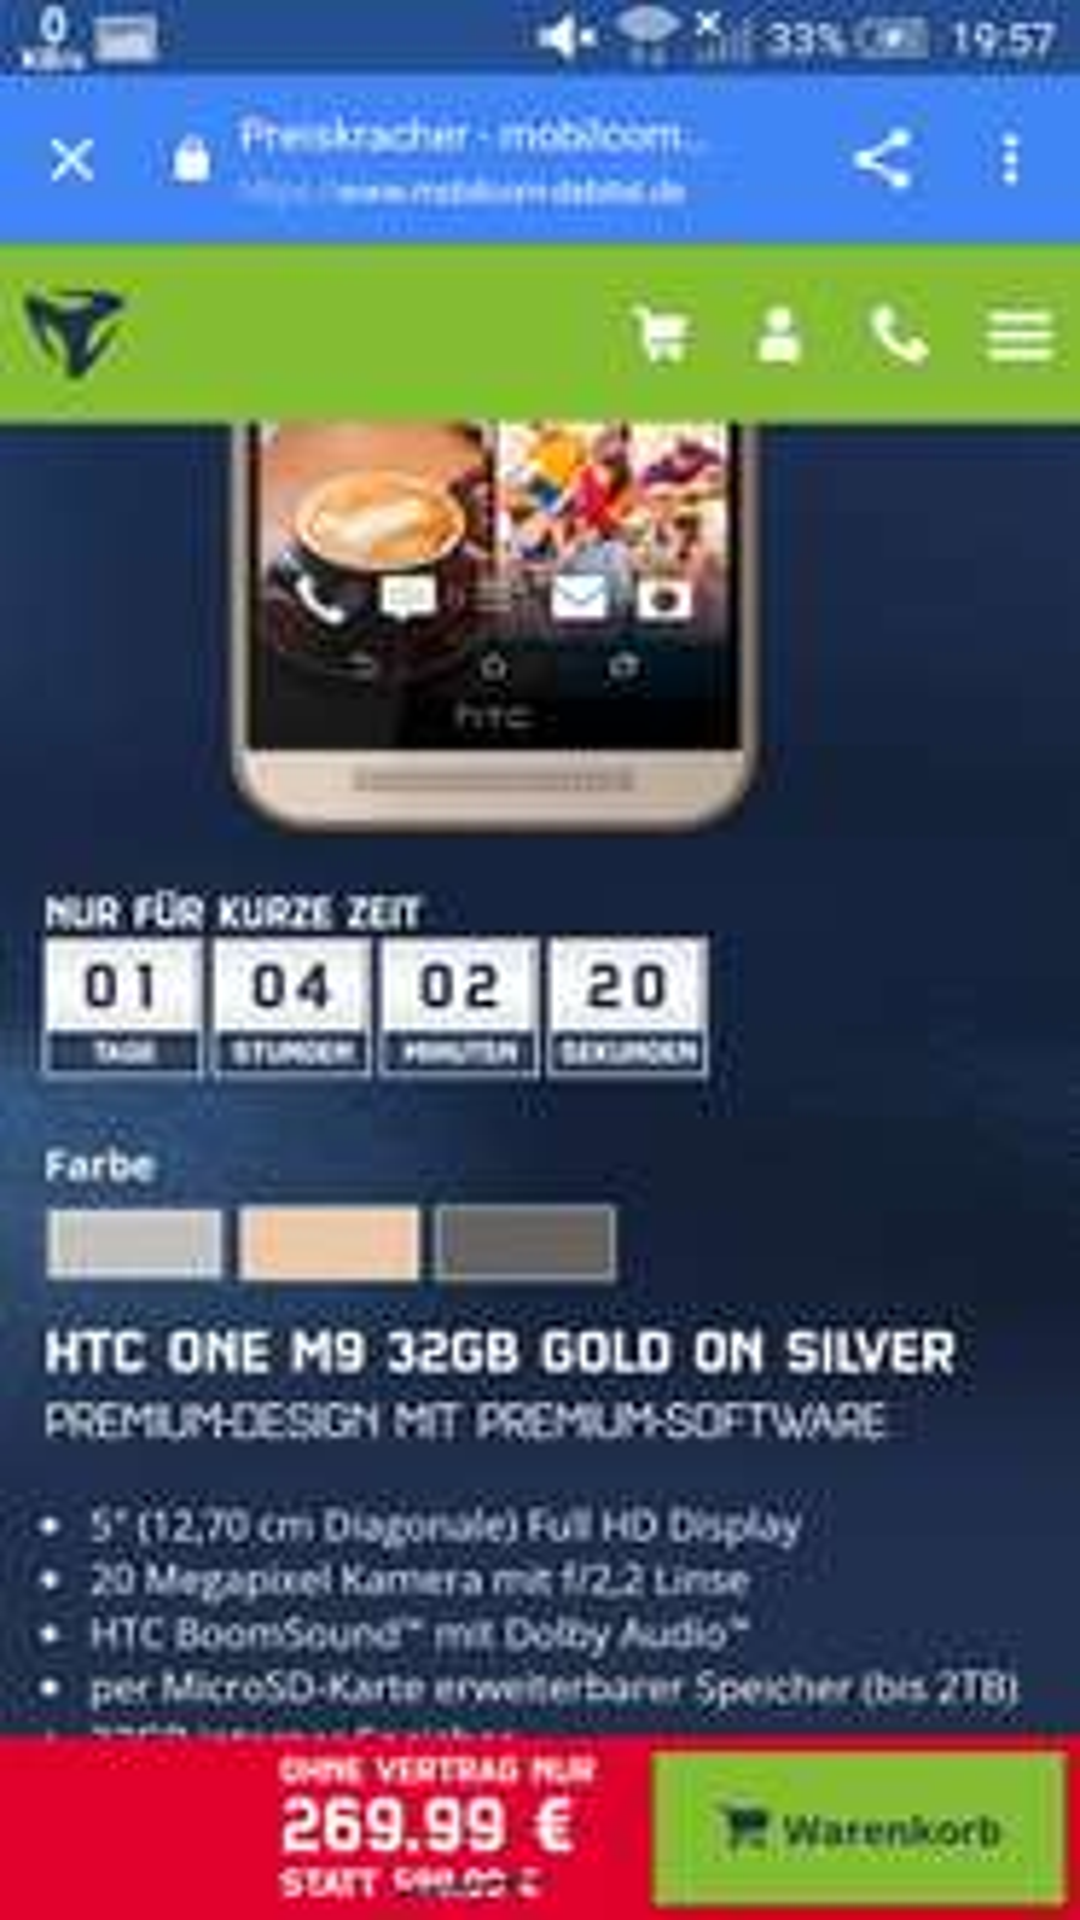 HTC One M9 inklusive Schutz Folie